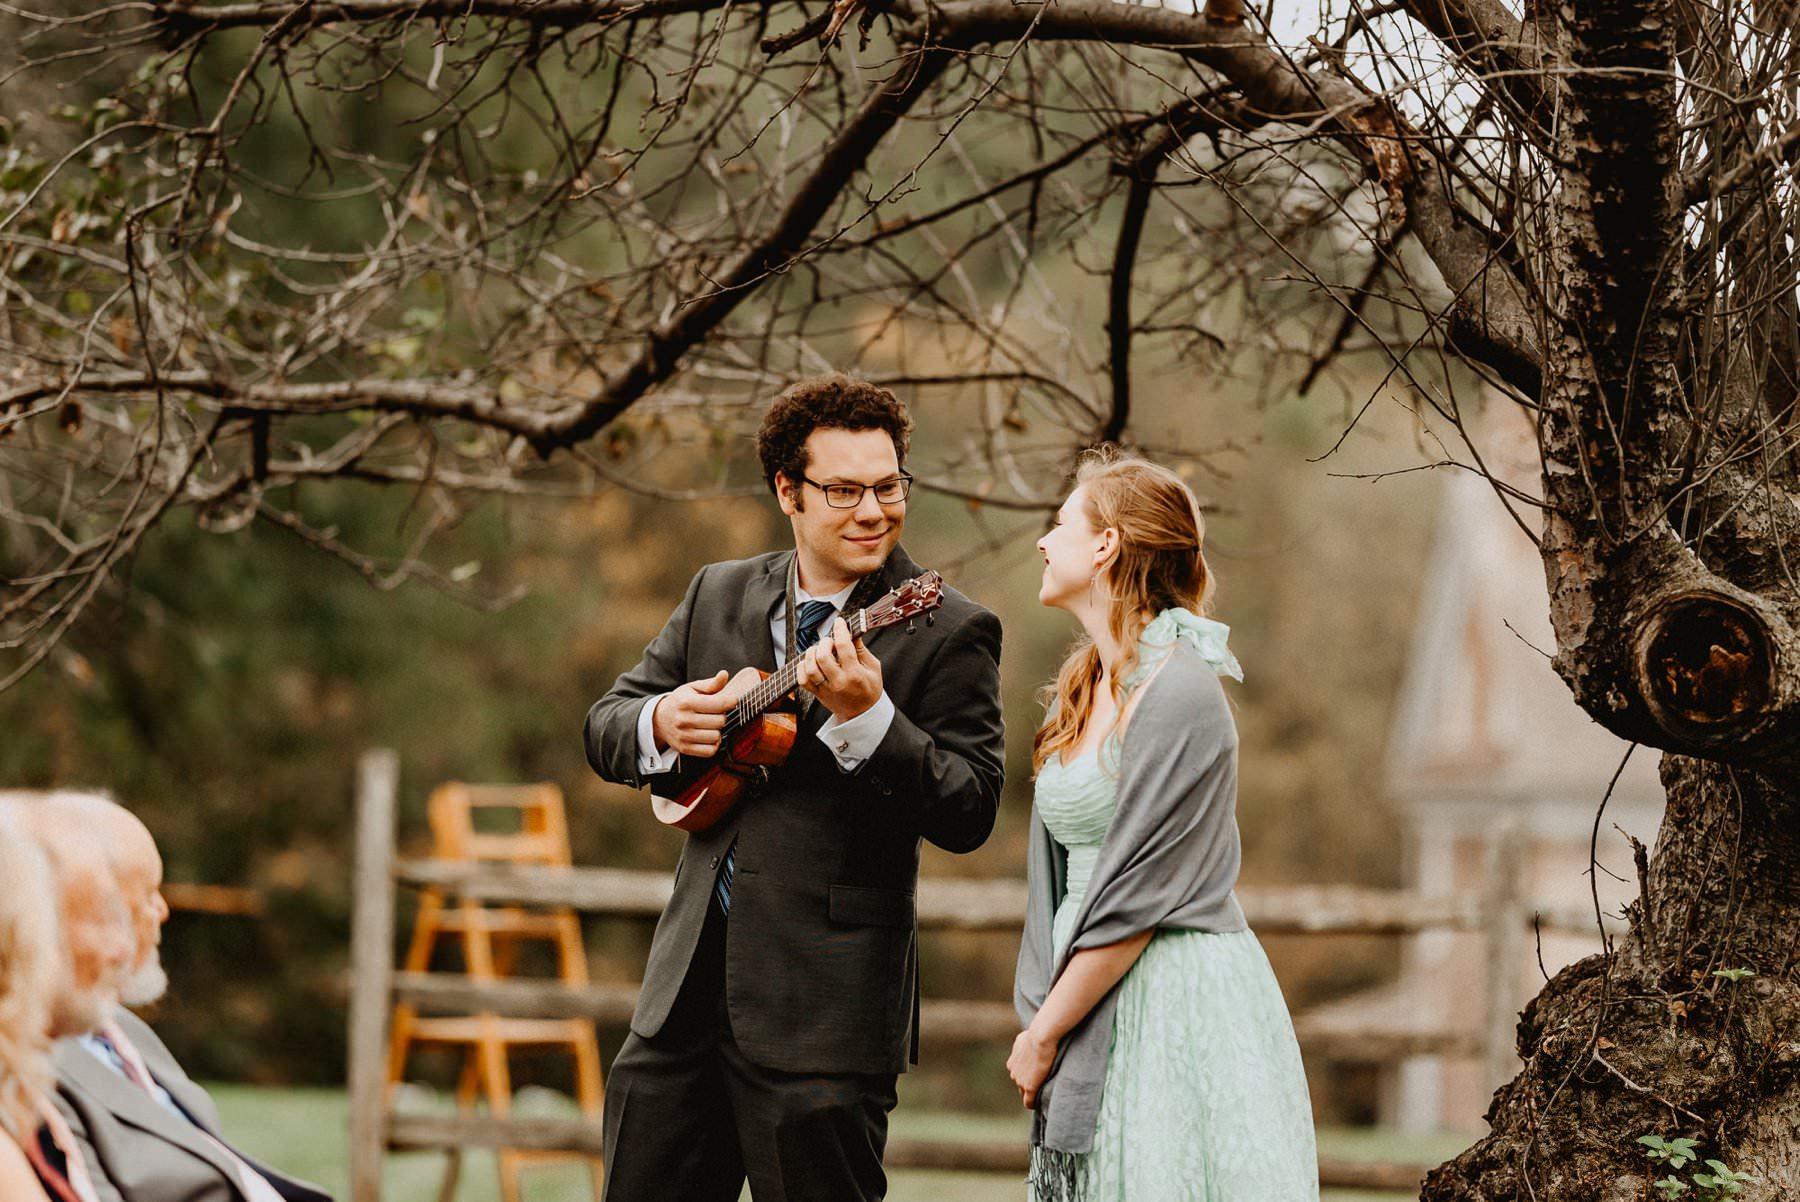 John_James_Audubon_Center_wedding-48.jpg